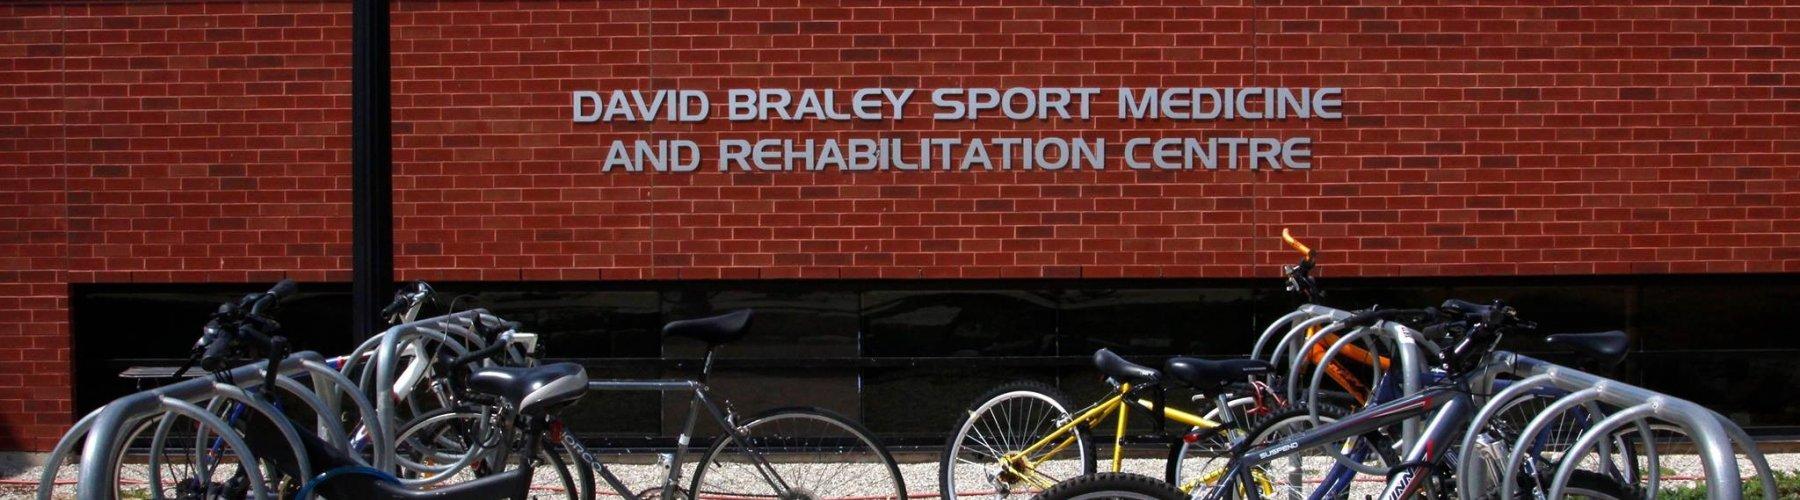 David Braley Sport Medicine & Rehabilitation Centre